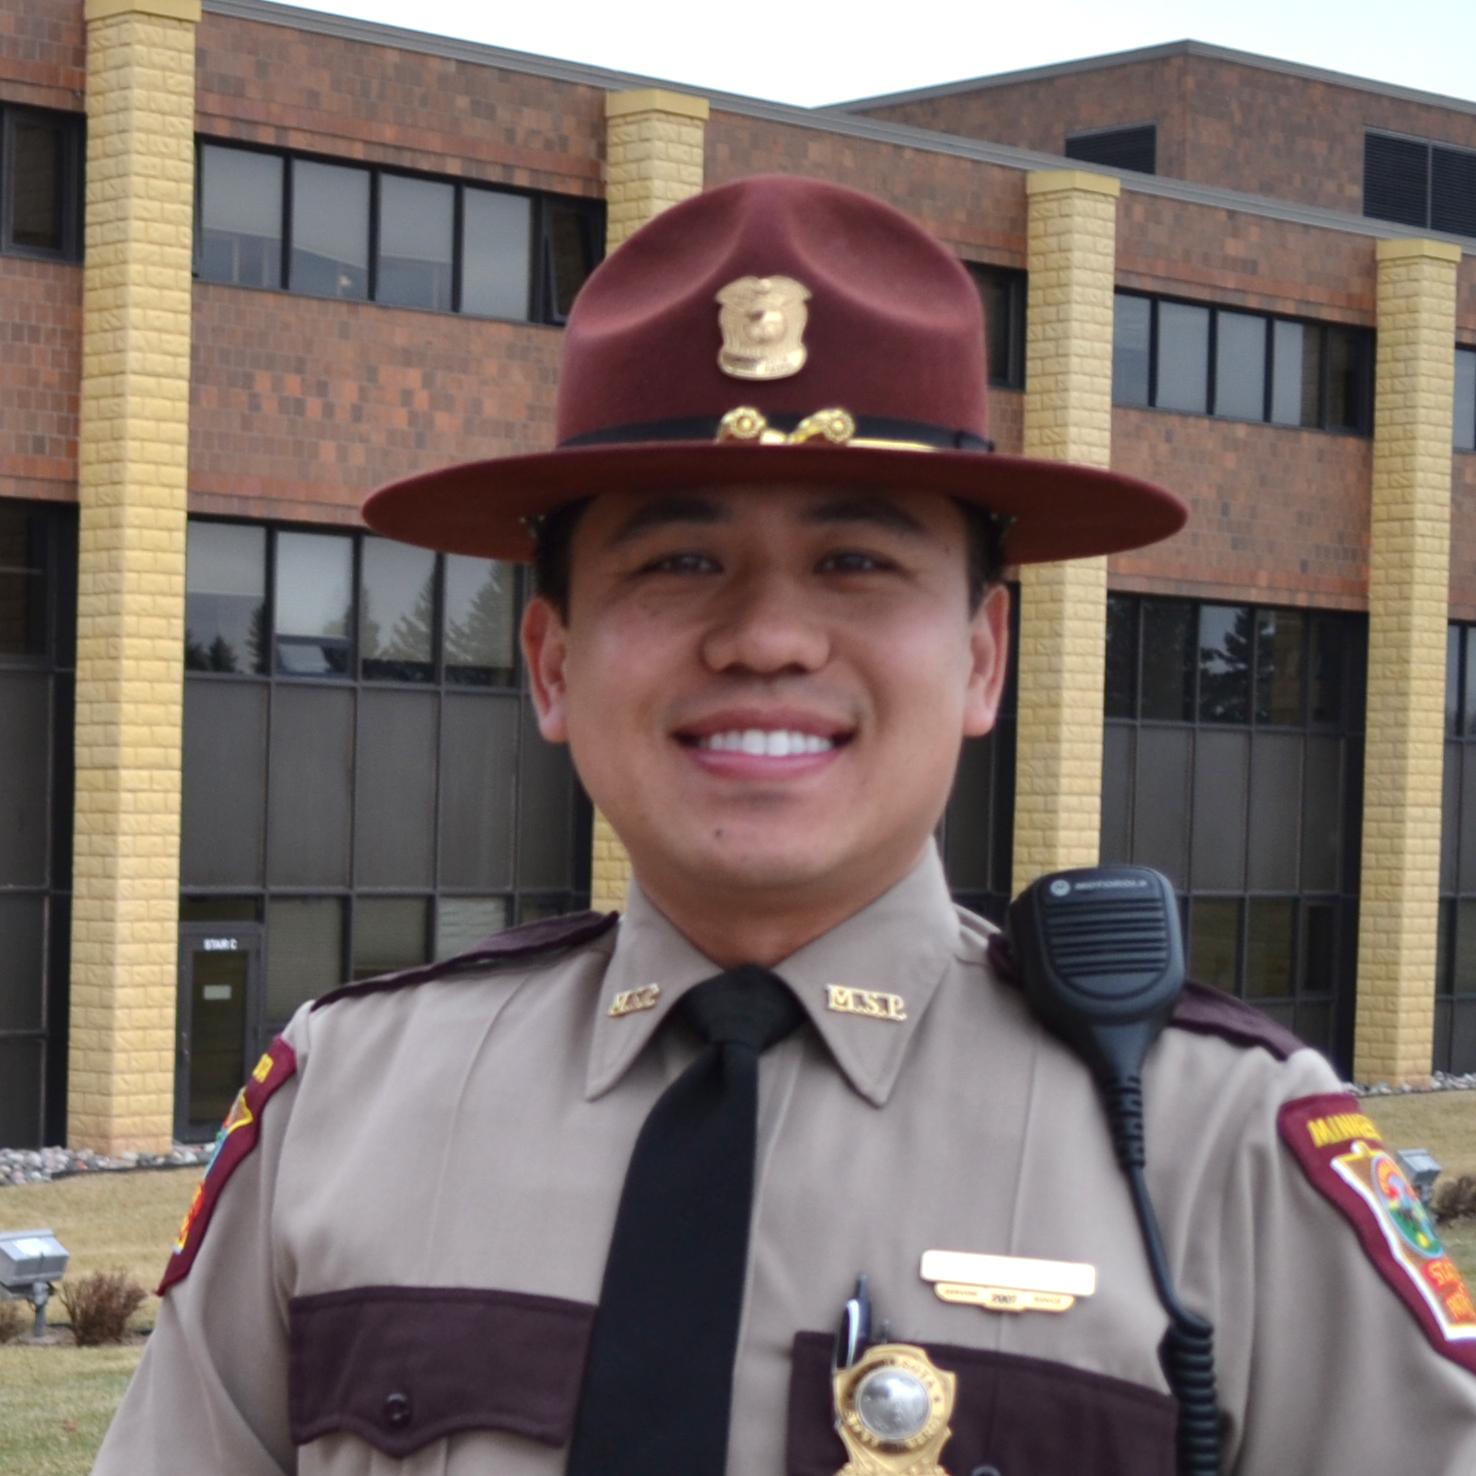 Chang Her, Century College Law Enforcement alumni